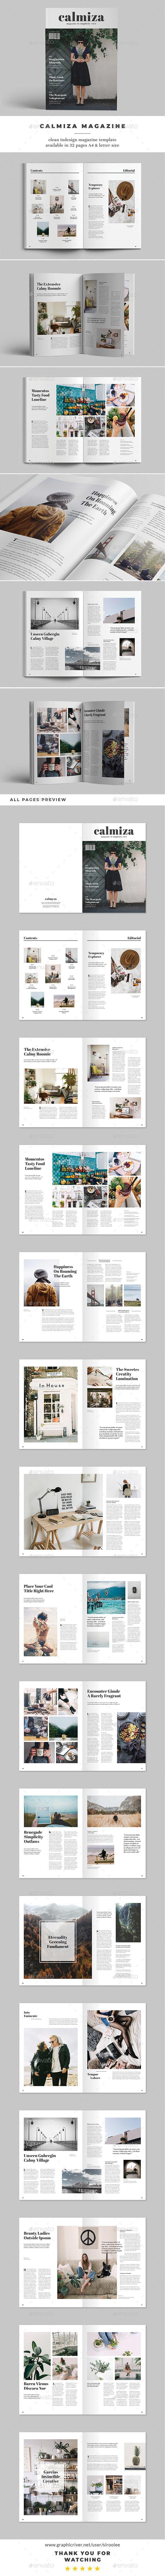 Calmiza Magazine - Magazines Print Templates